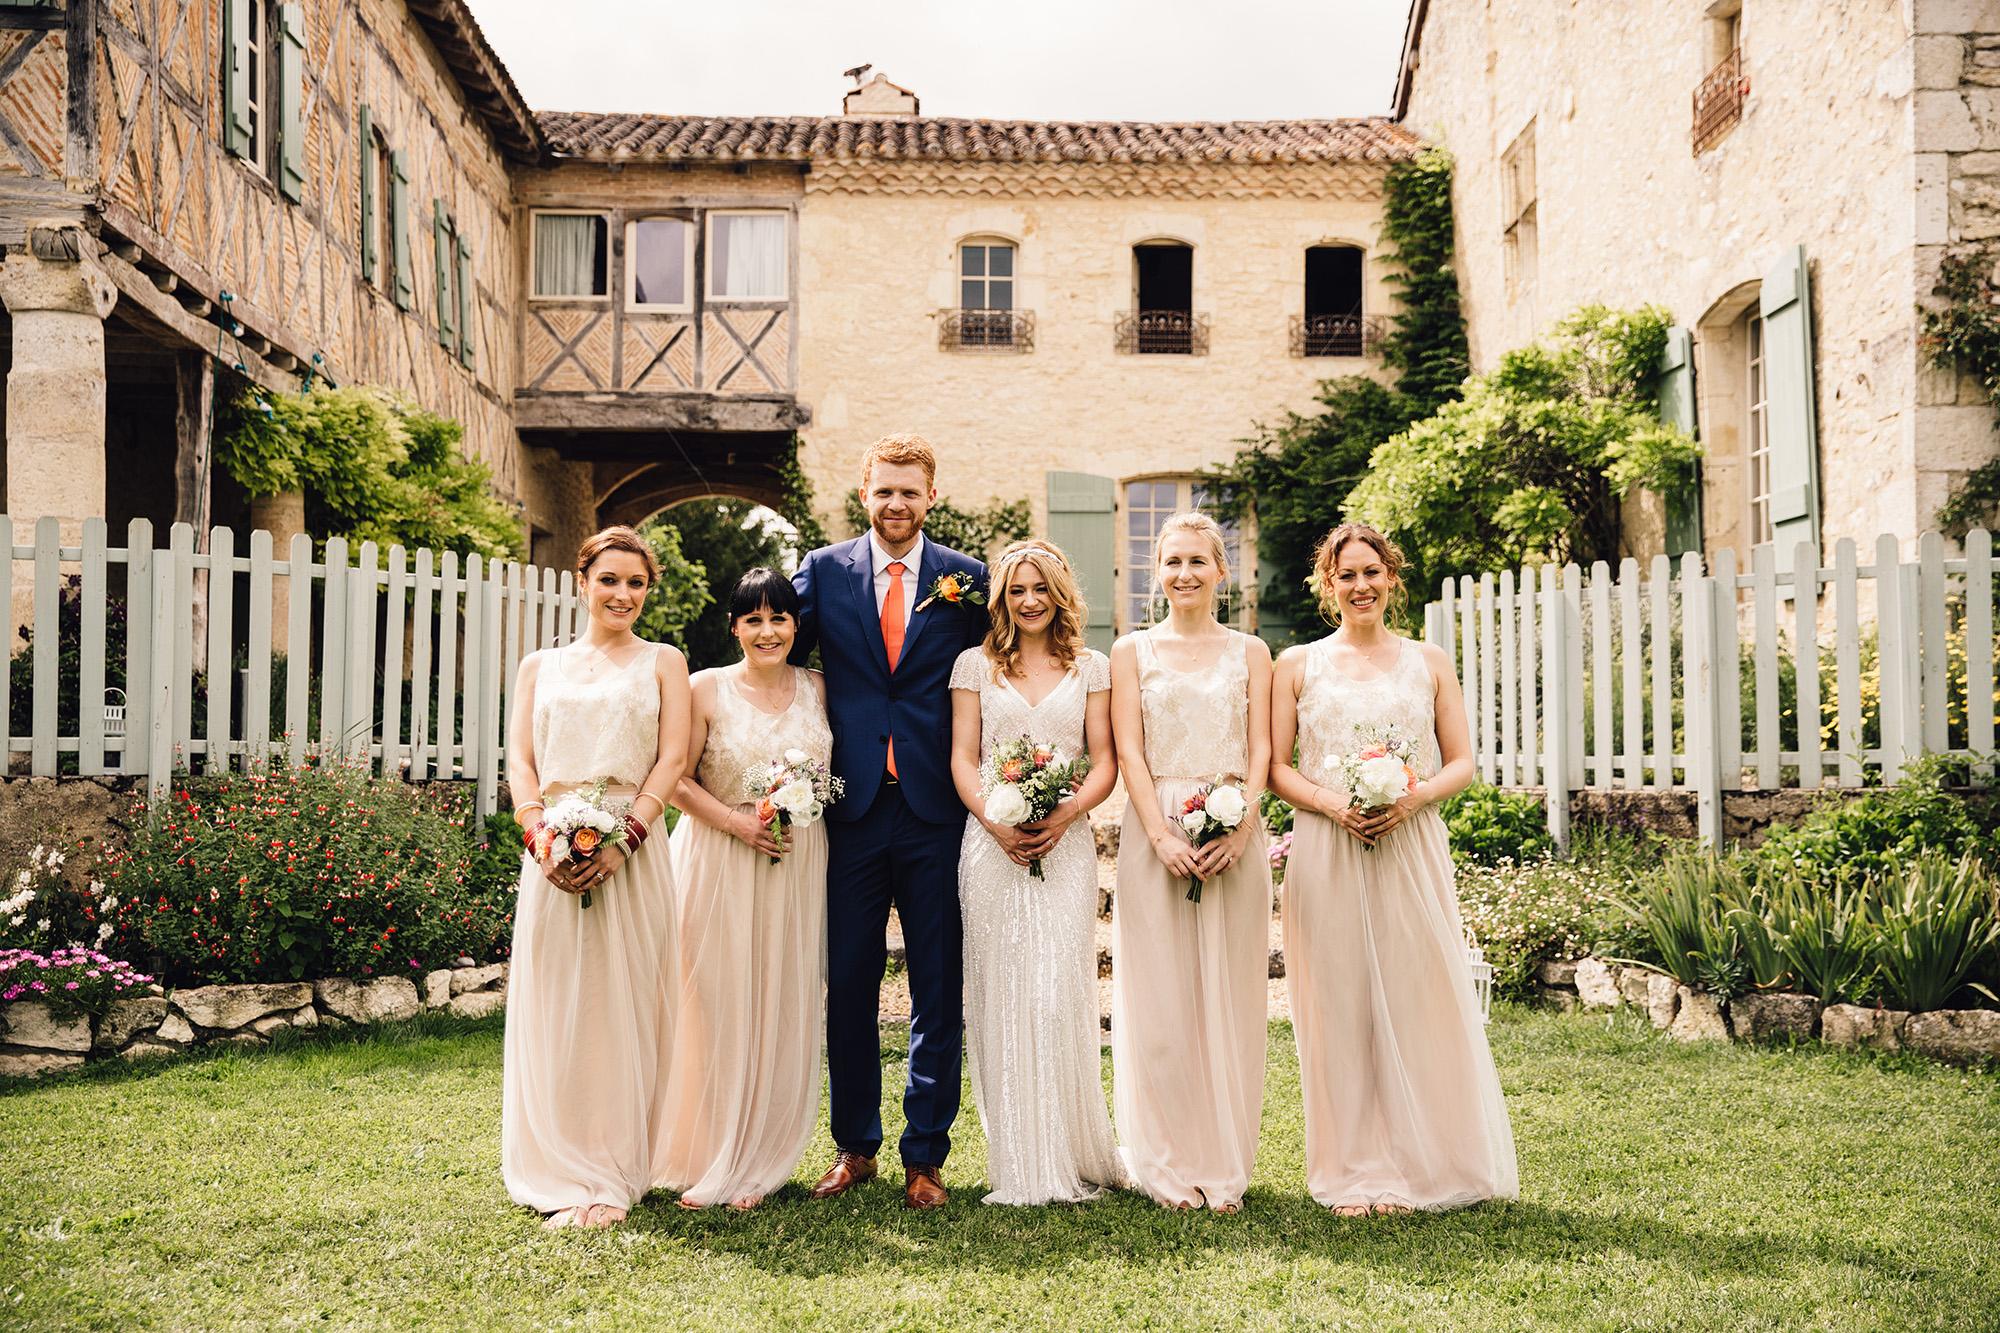 Hannah-Bespoke-Bridesmaids-Bohemian-French-Wedding-Gold-Lace-Susanna-Greening-Designs-Matlock-Derbyshire-16